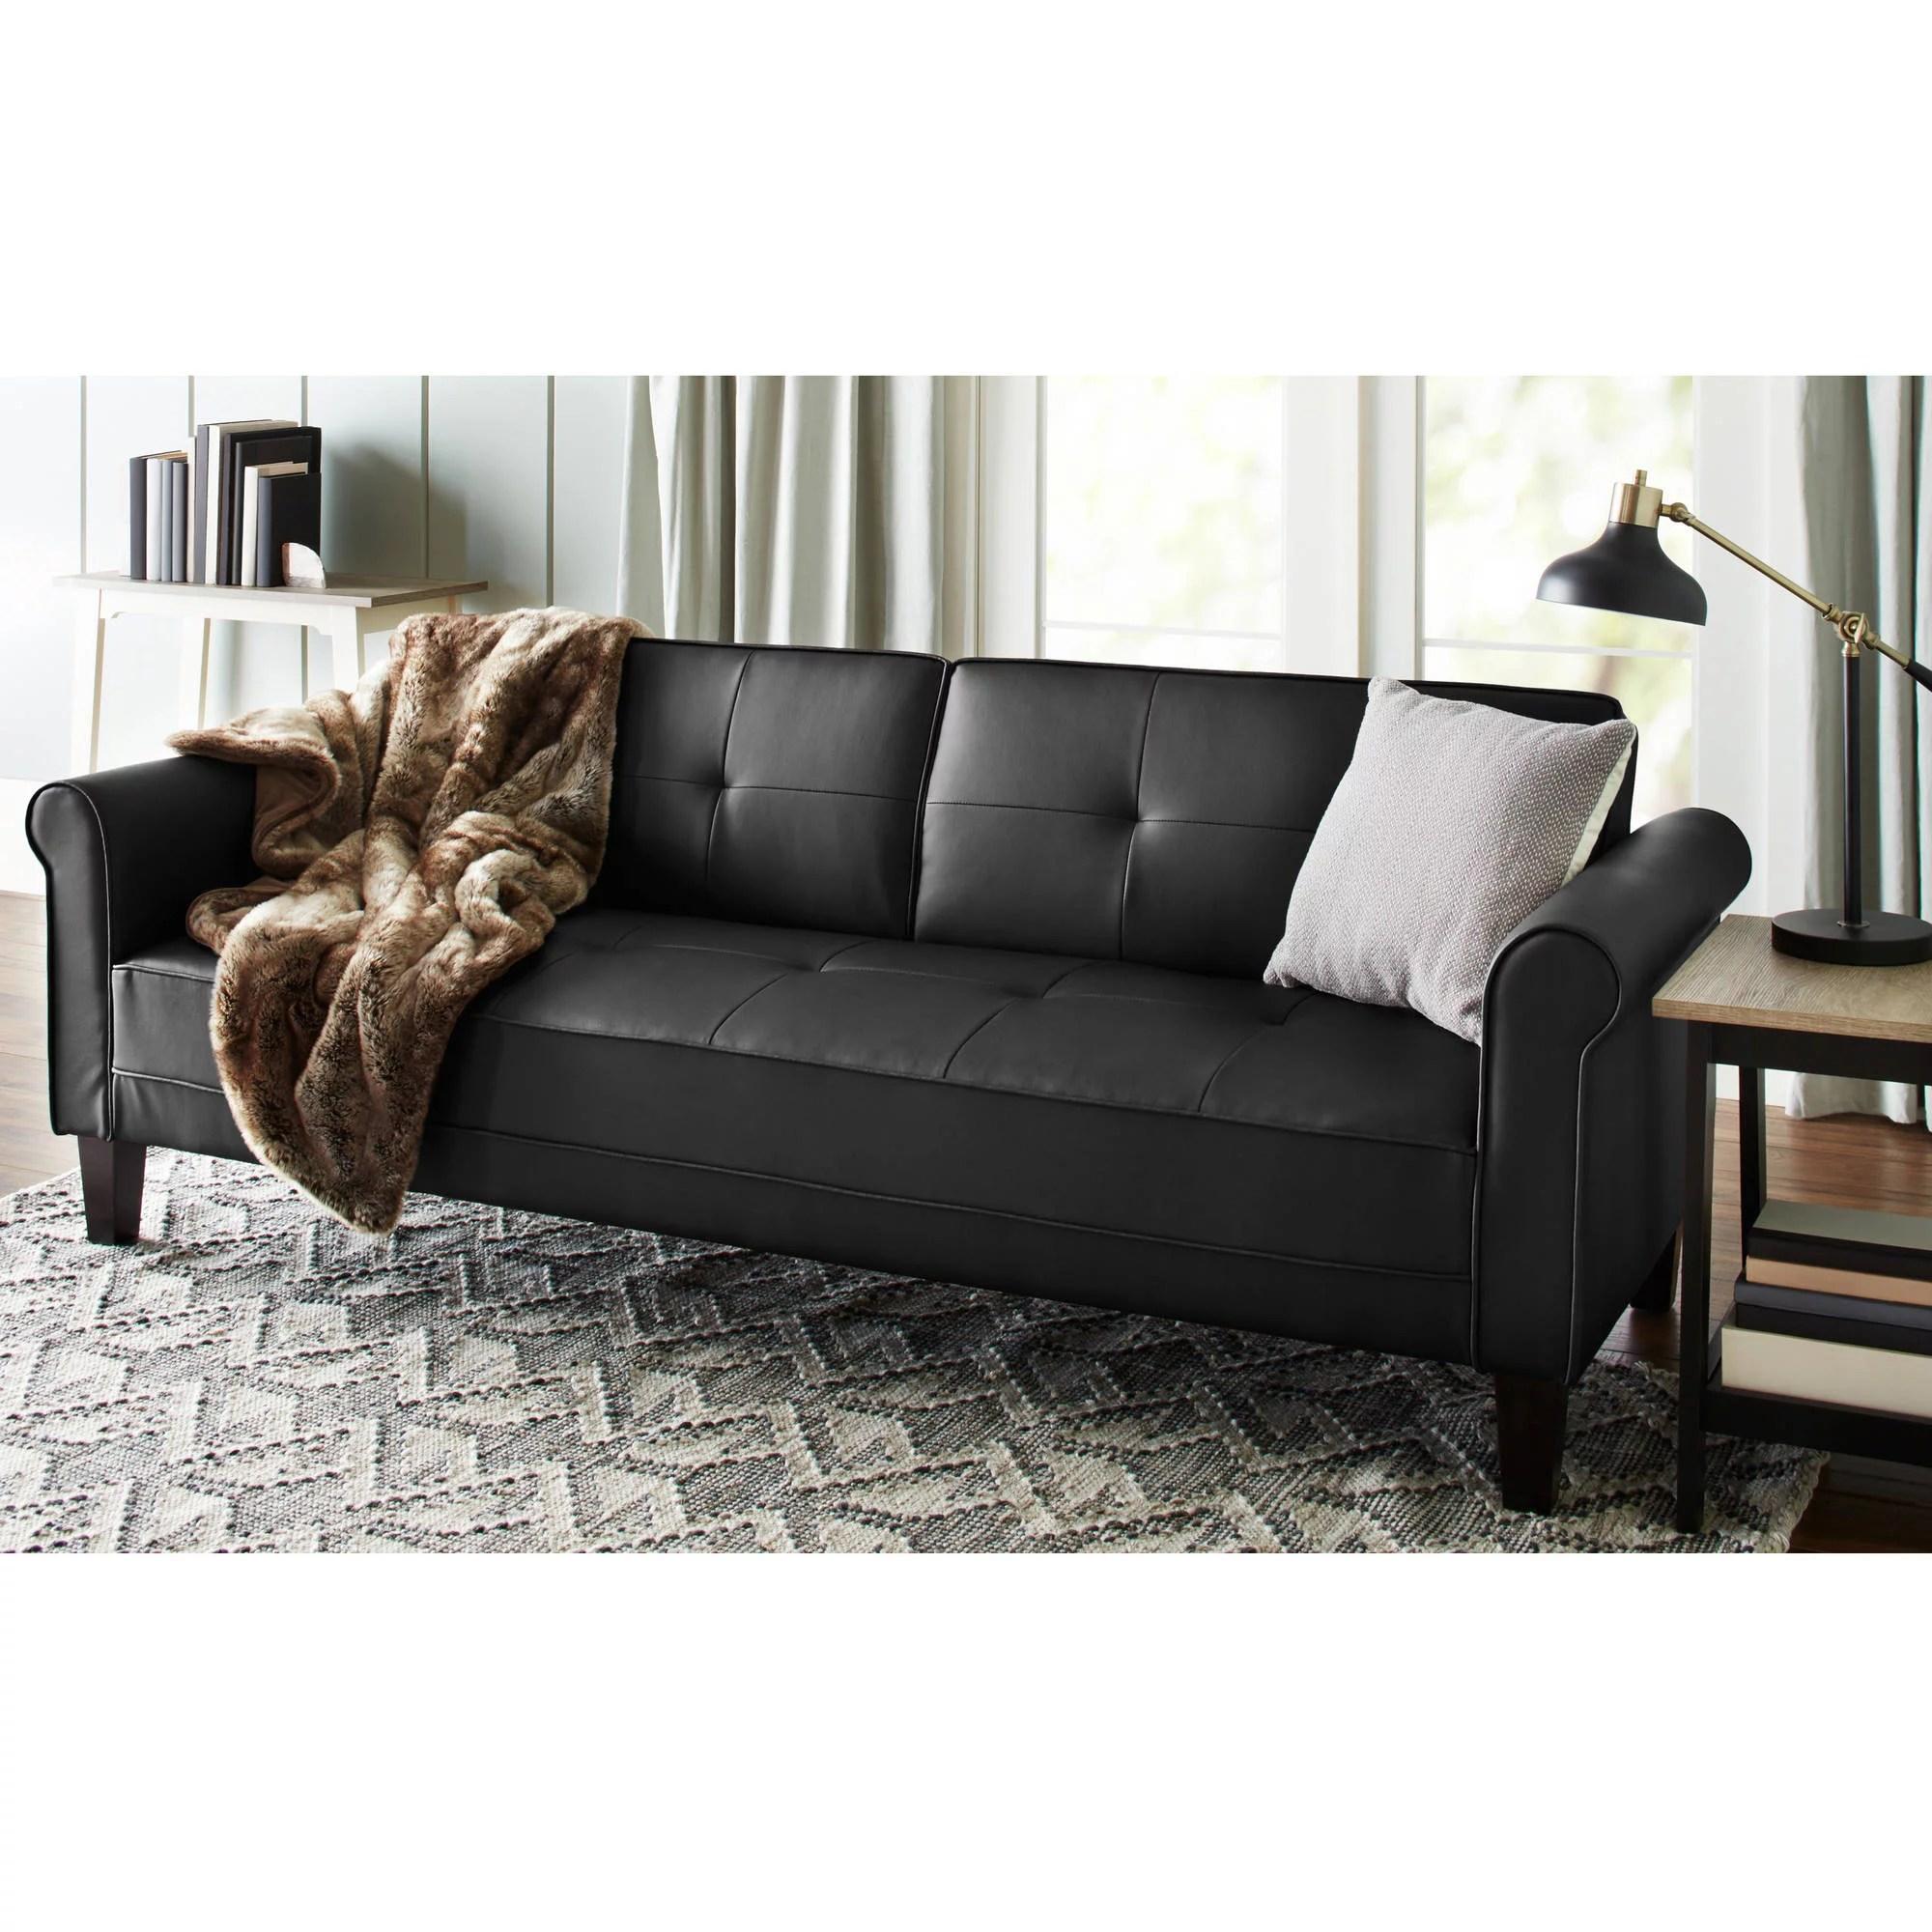 mission brown leather sofa sofas bege com almofadas coloridas baxton studio charlotte modern classic style wood